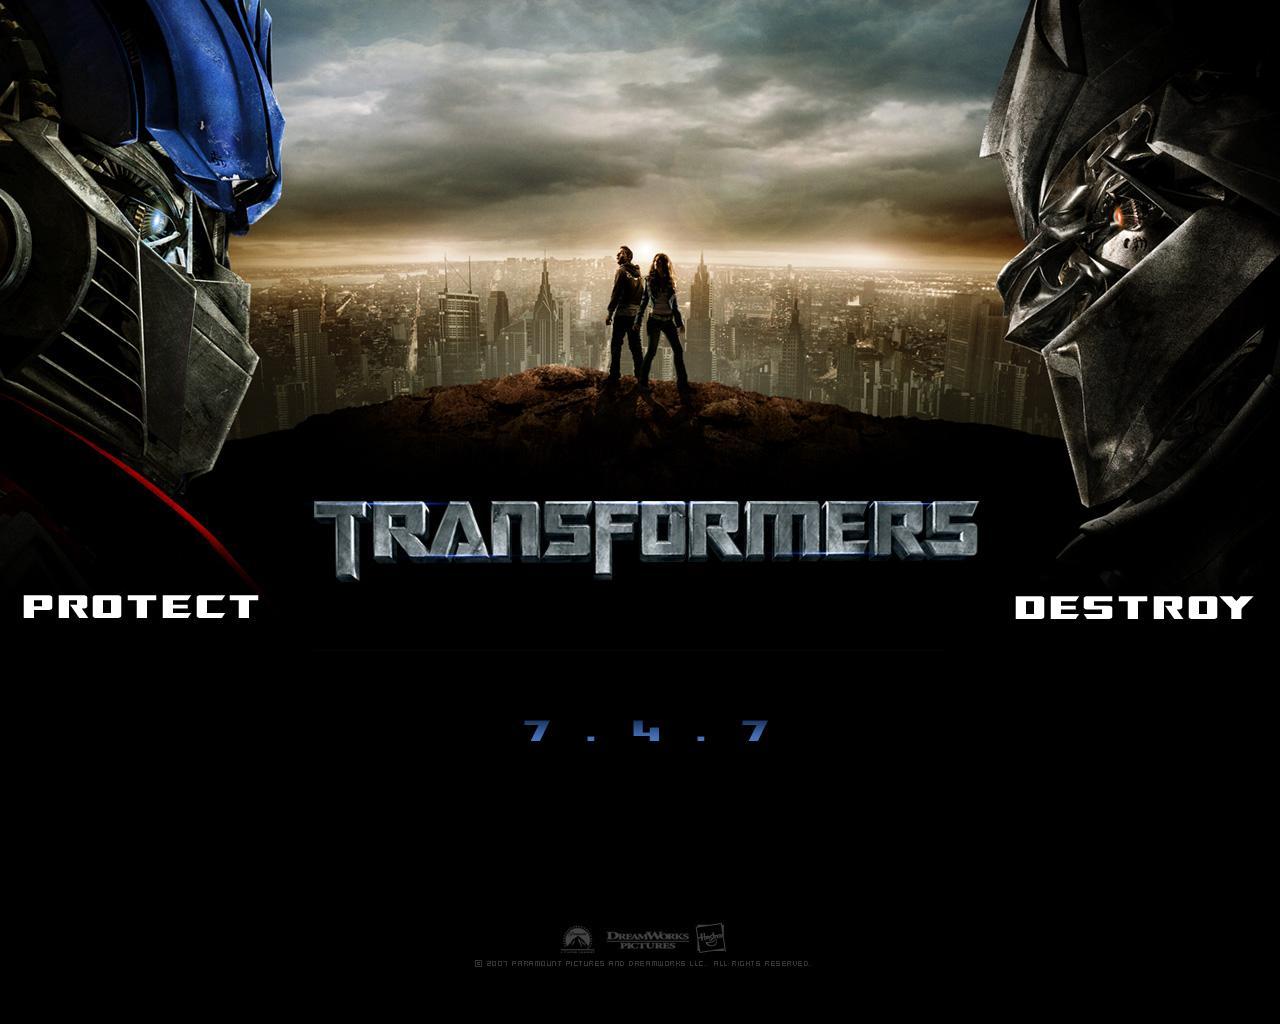 Transformers The Movie Poster Desktop Background W1